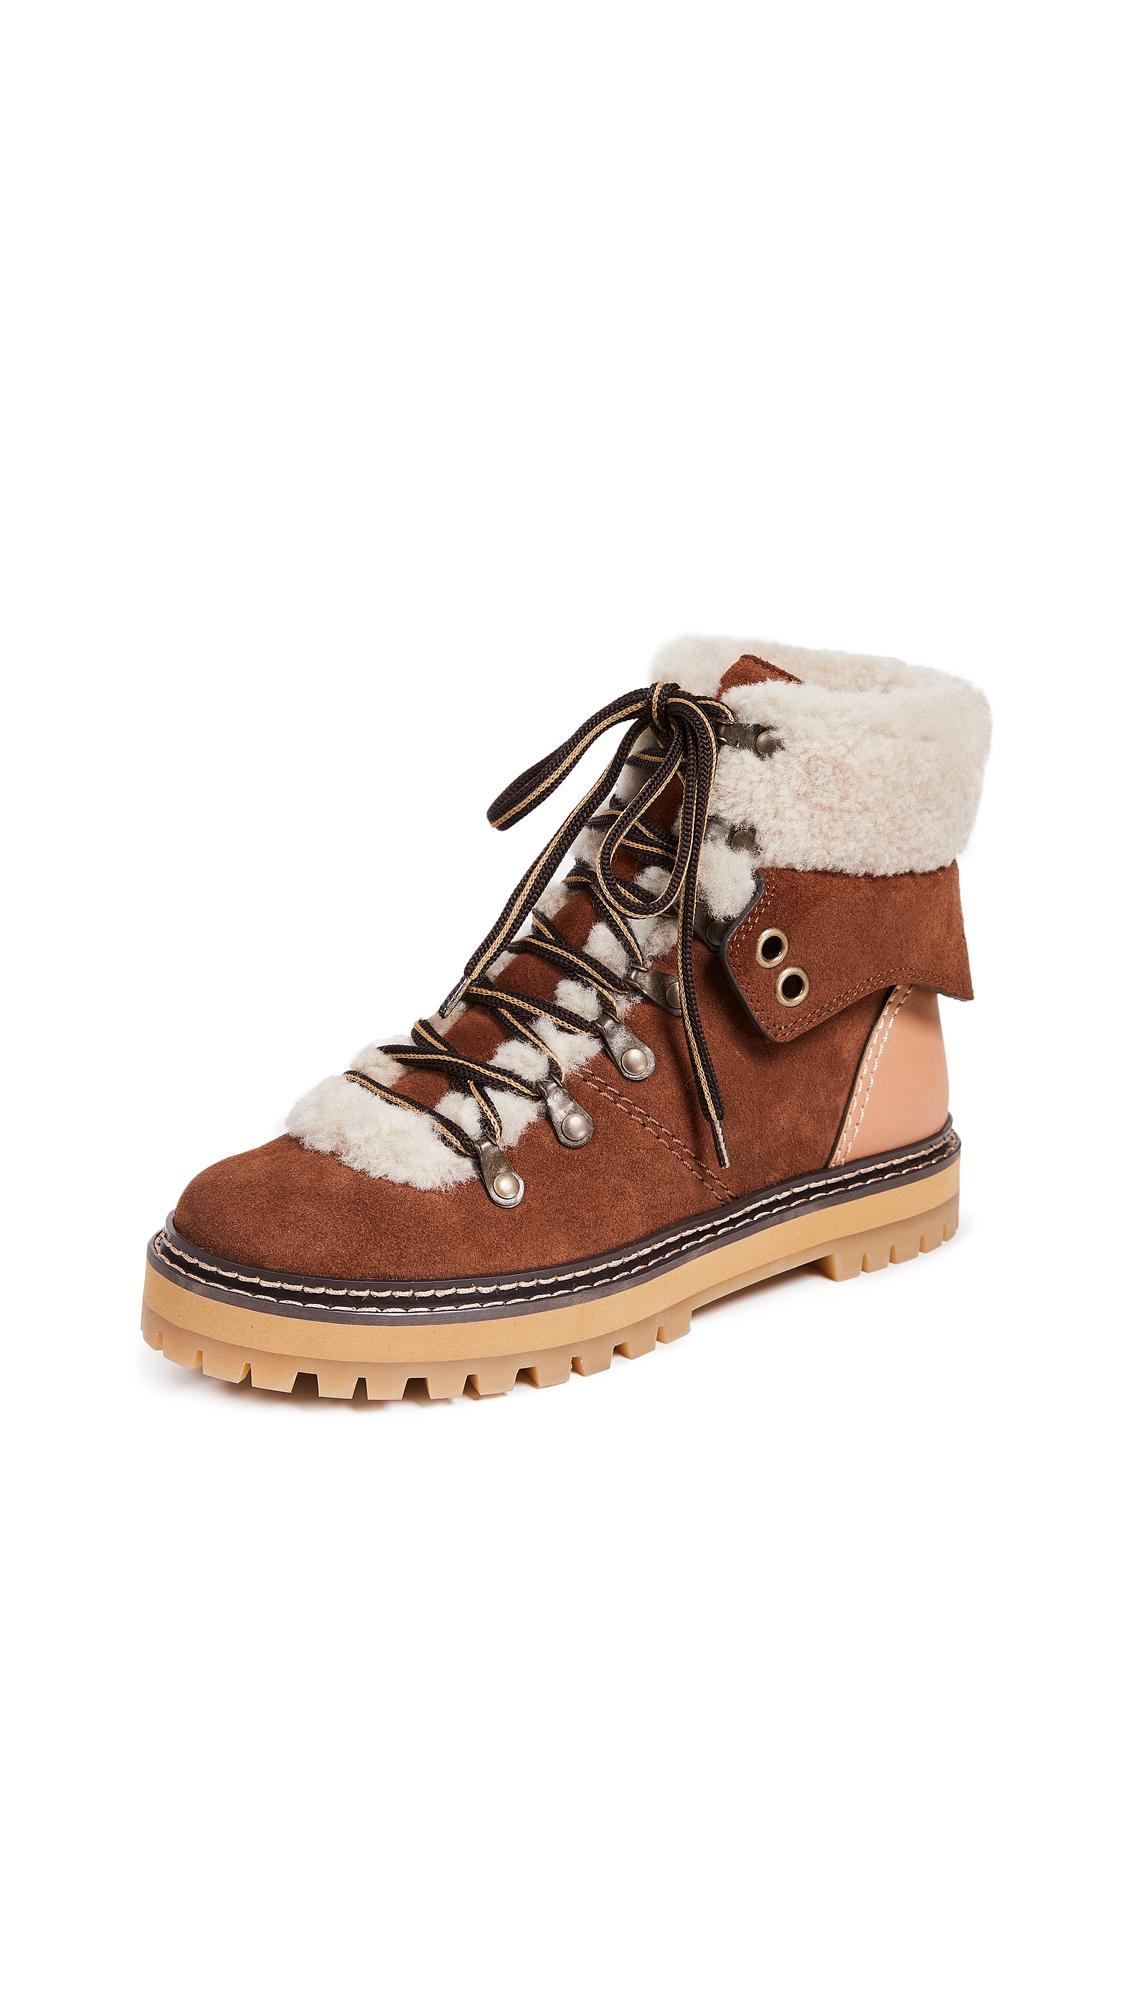 Photo of See by Chloe Eileen Flat Boots - buy See by Chloe footwear online